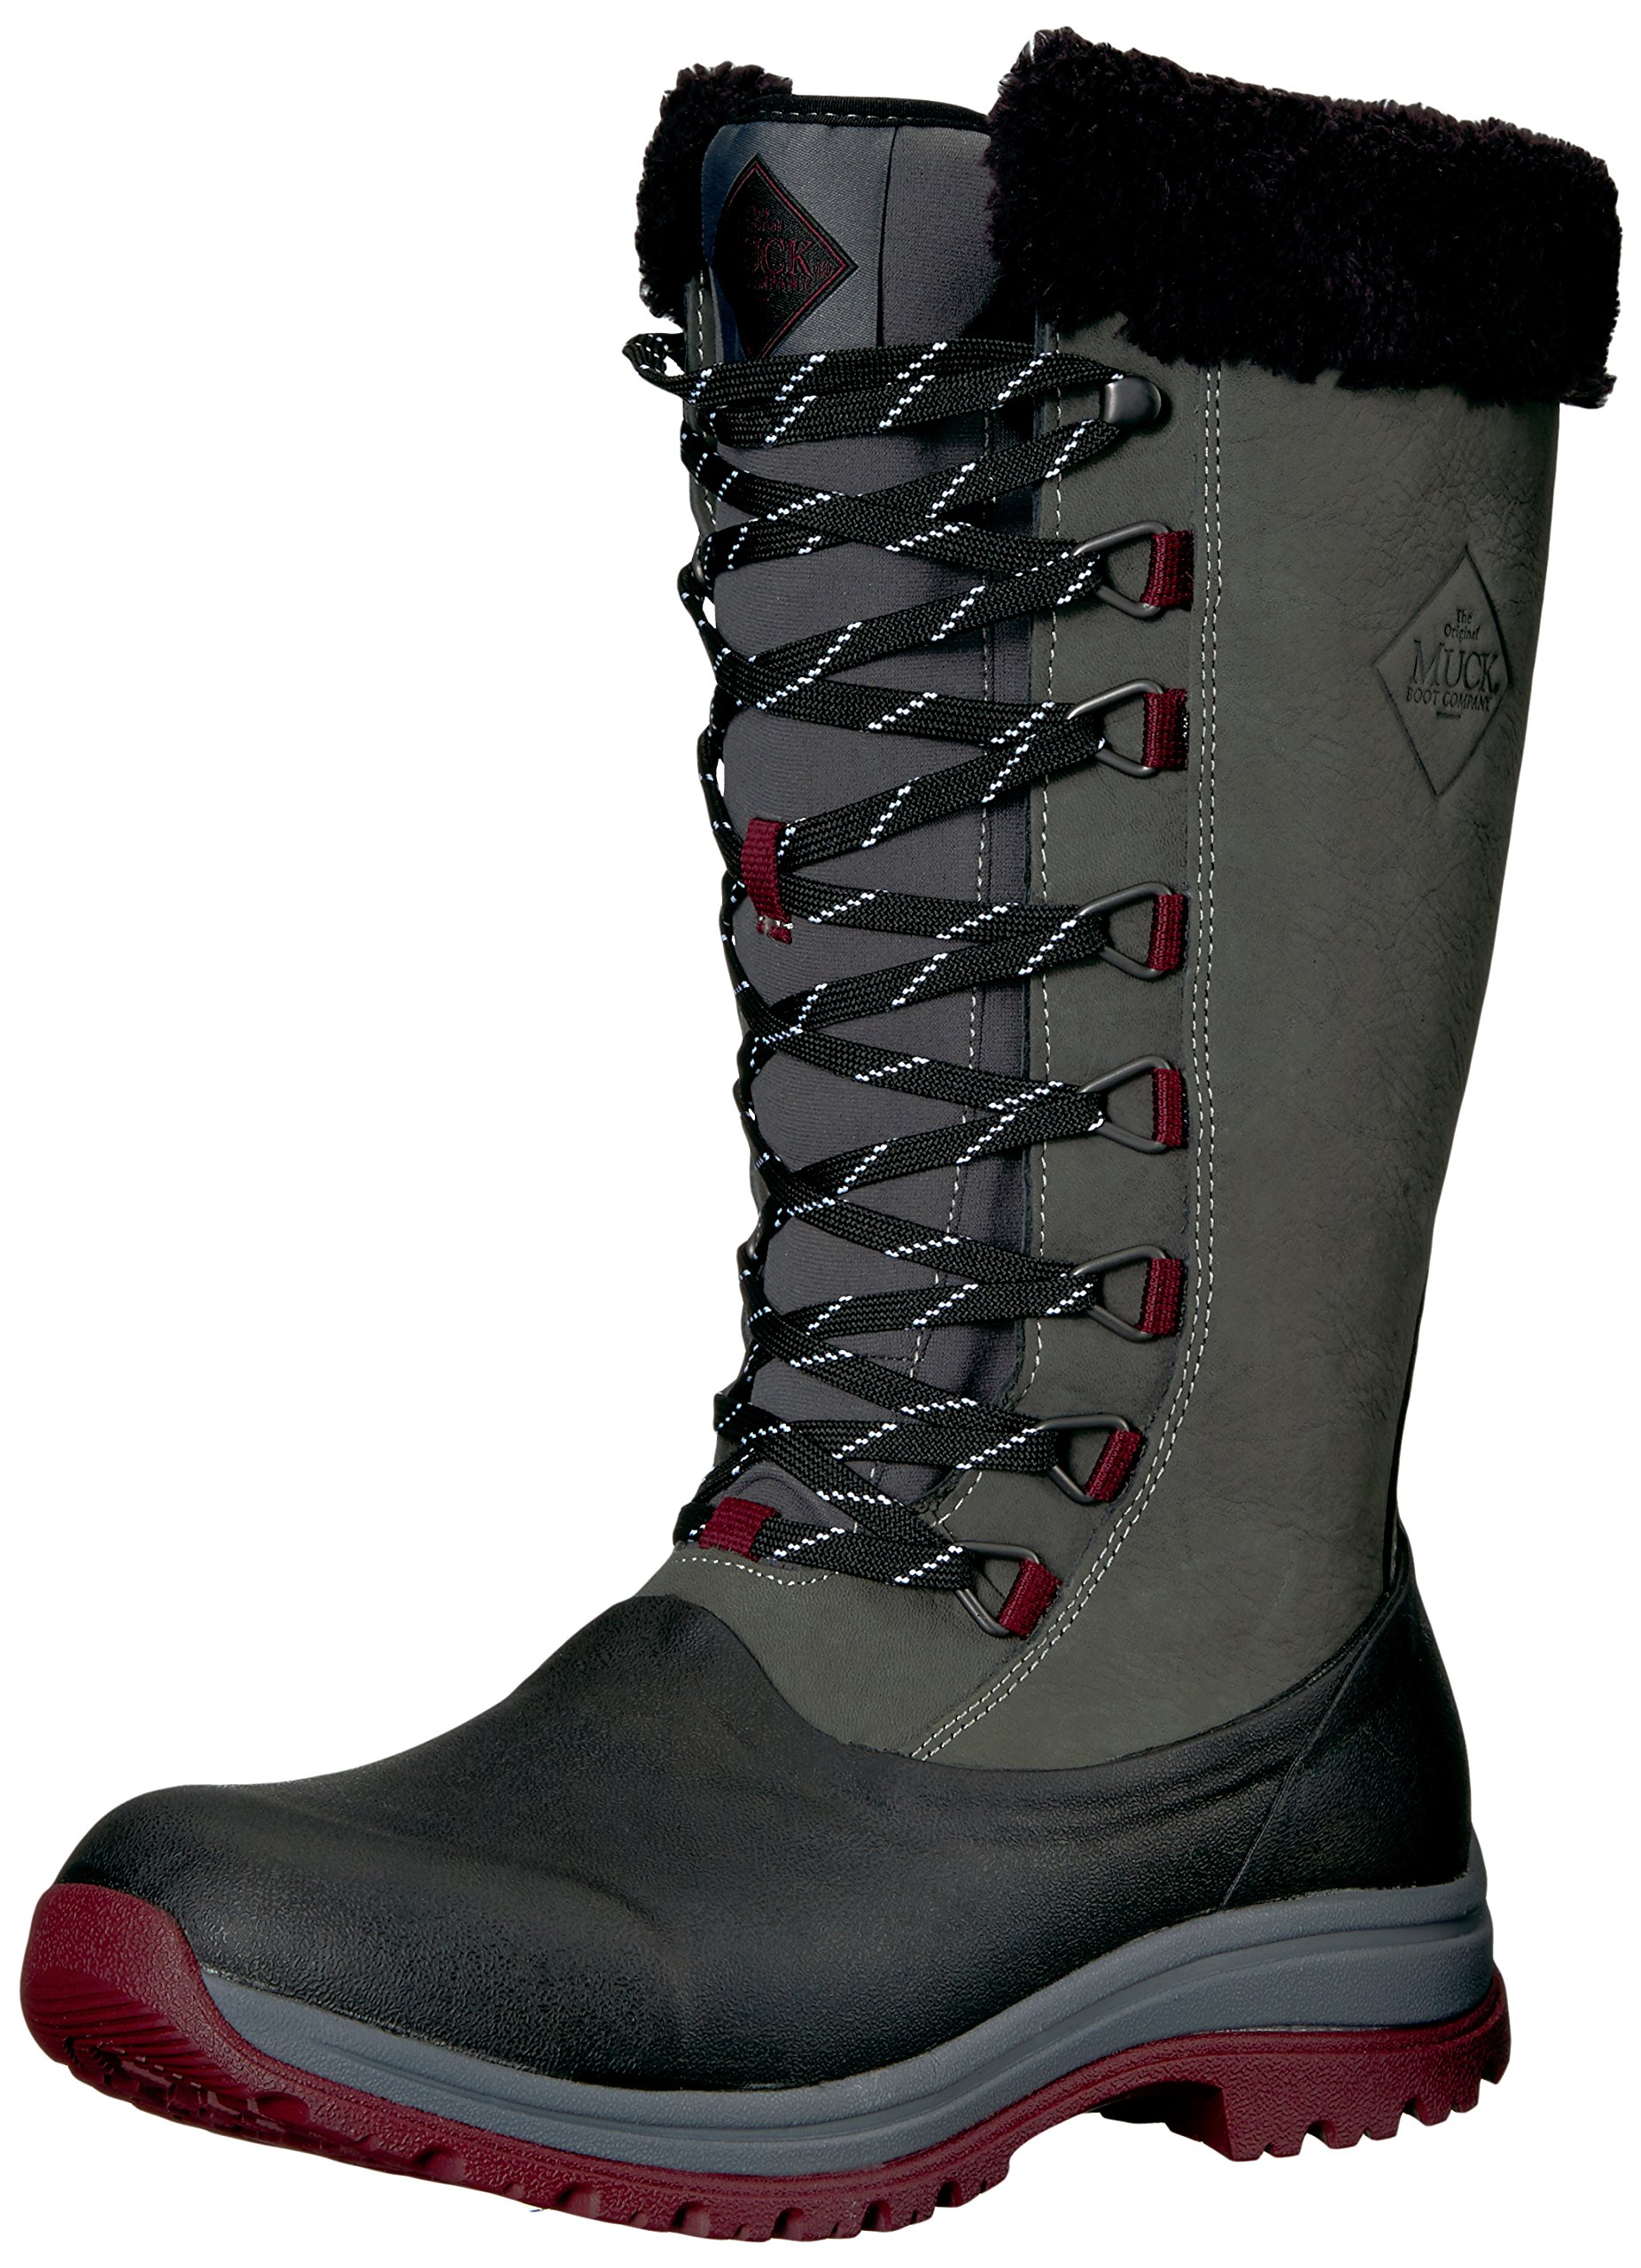 Muck Boot Women's Apres Lace Tall (13'') Work Boot, Otter/Dark Navy, 9 M US